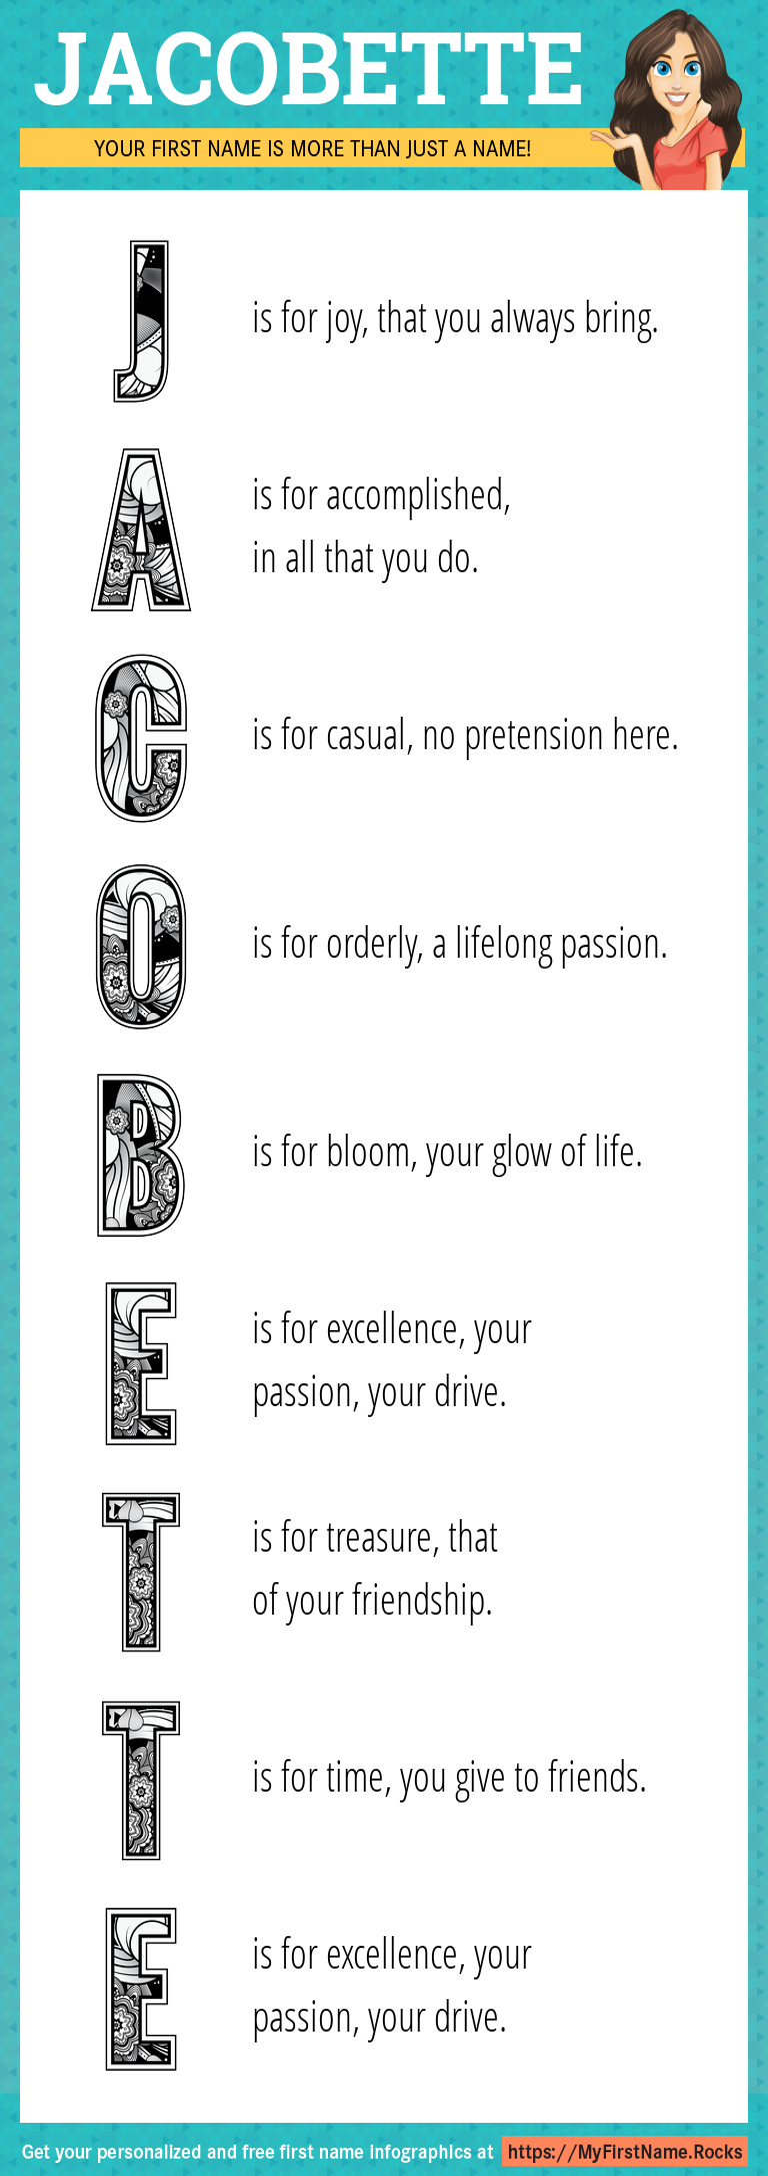 Jacobette Infographics